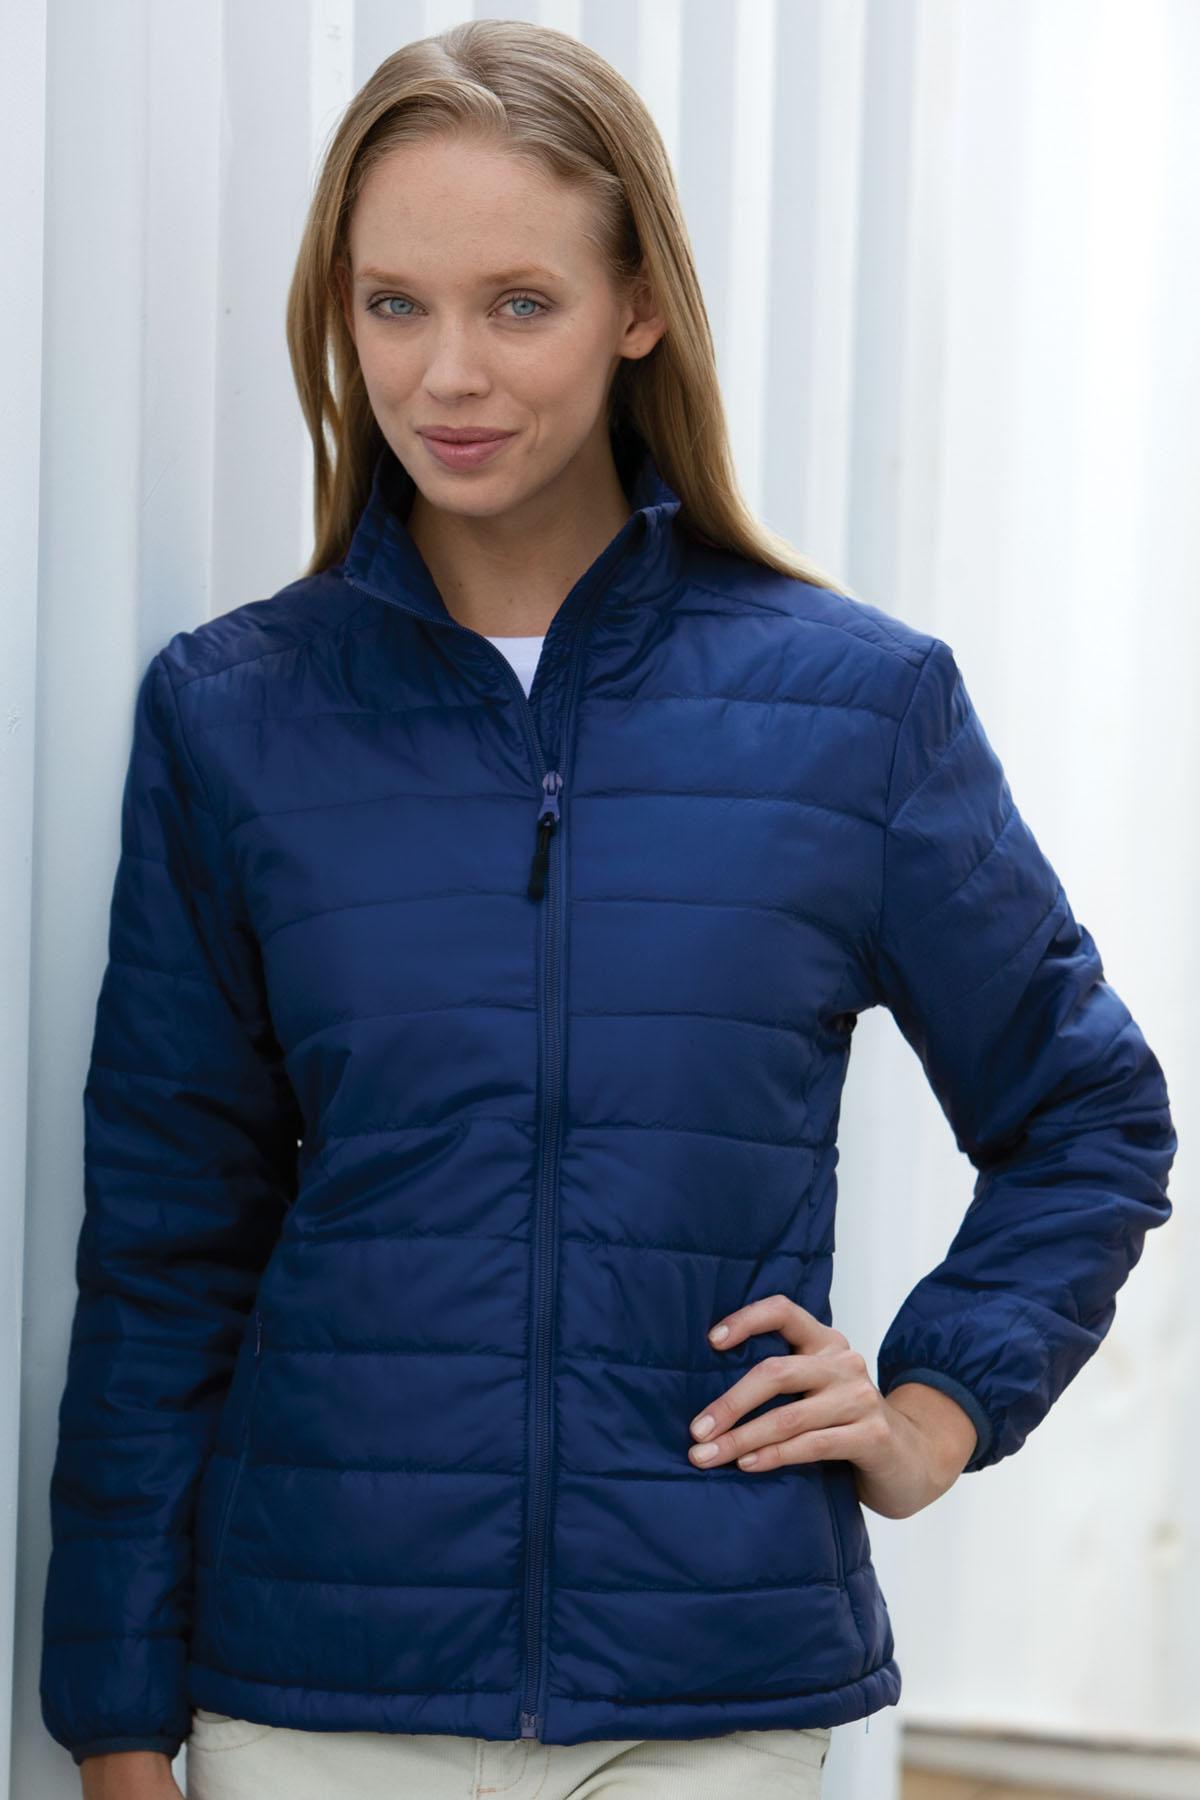 Vantage 7321 - Women's Apex Compressible Jacket